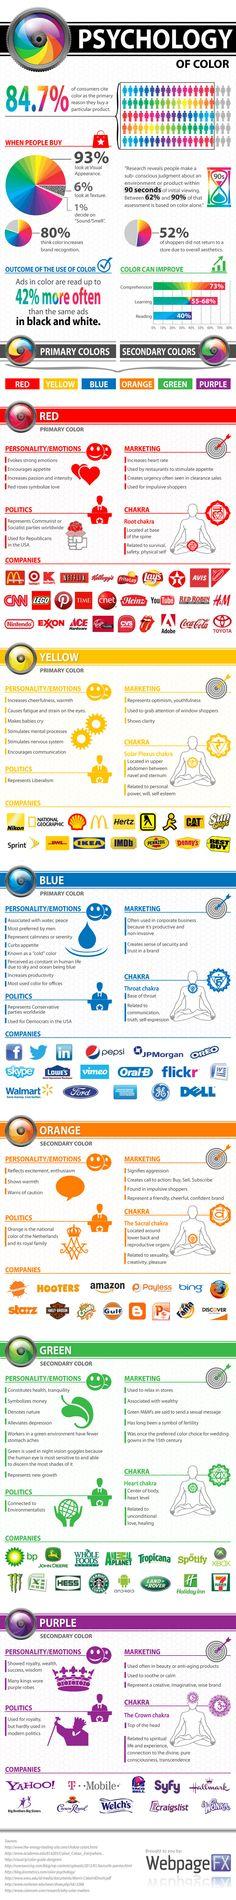 Logo Color Psychology Considerations | StockLogos.com